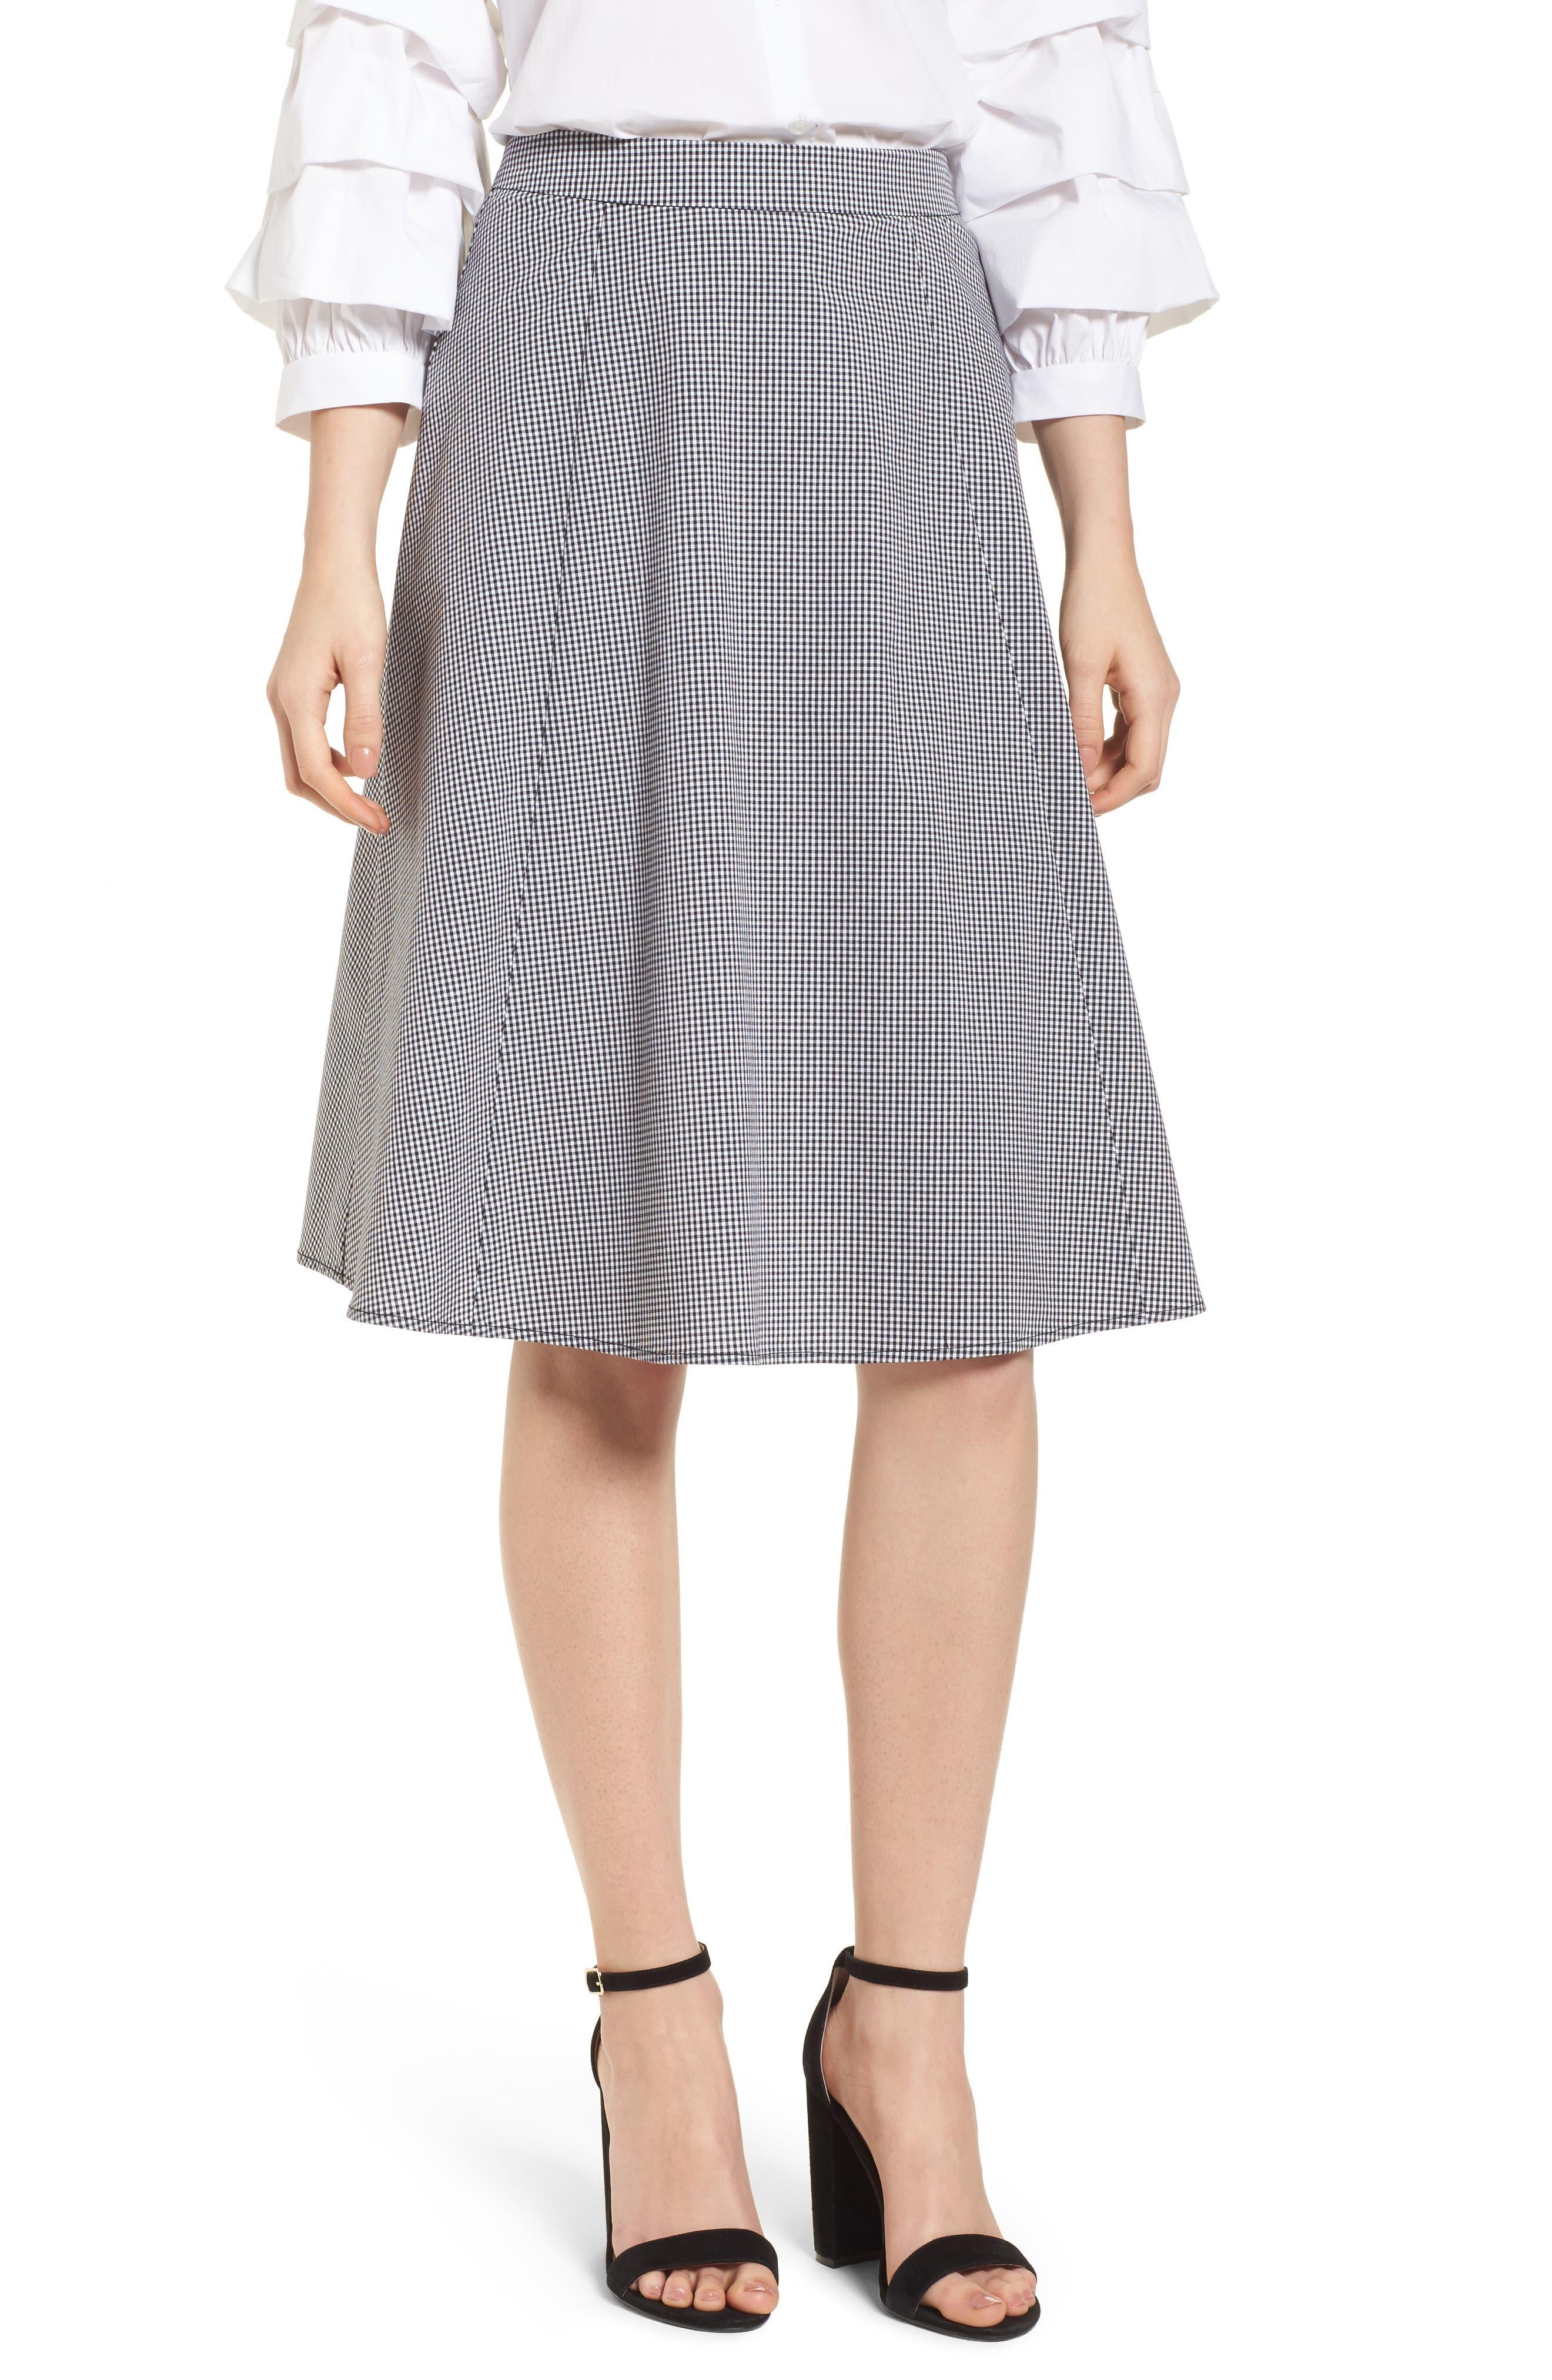 Gingham A-Line Skirt,                         Main,                         color, Black/ White